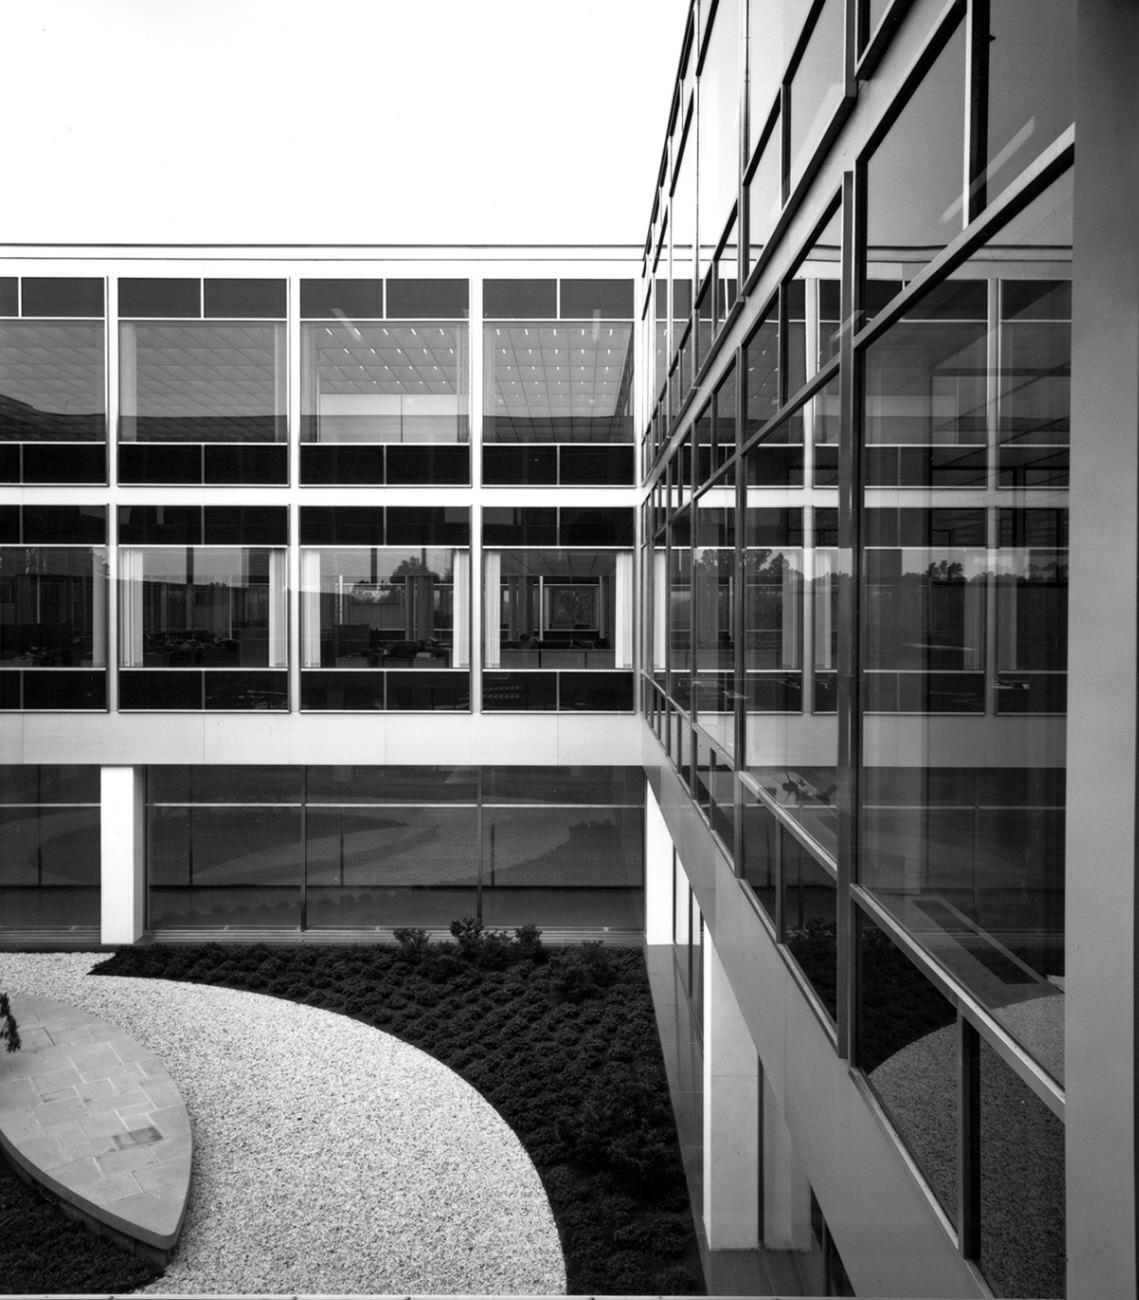 Connecticut General Life Insurance Company Headquarters